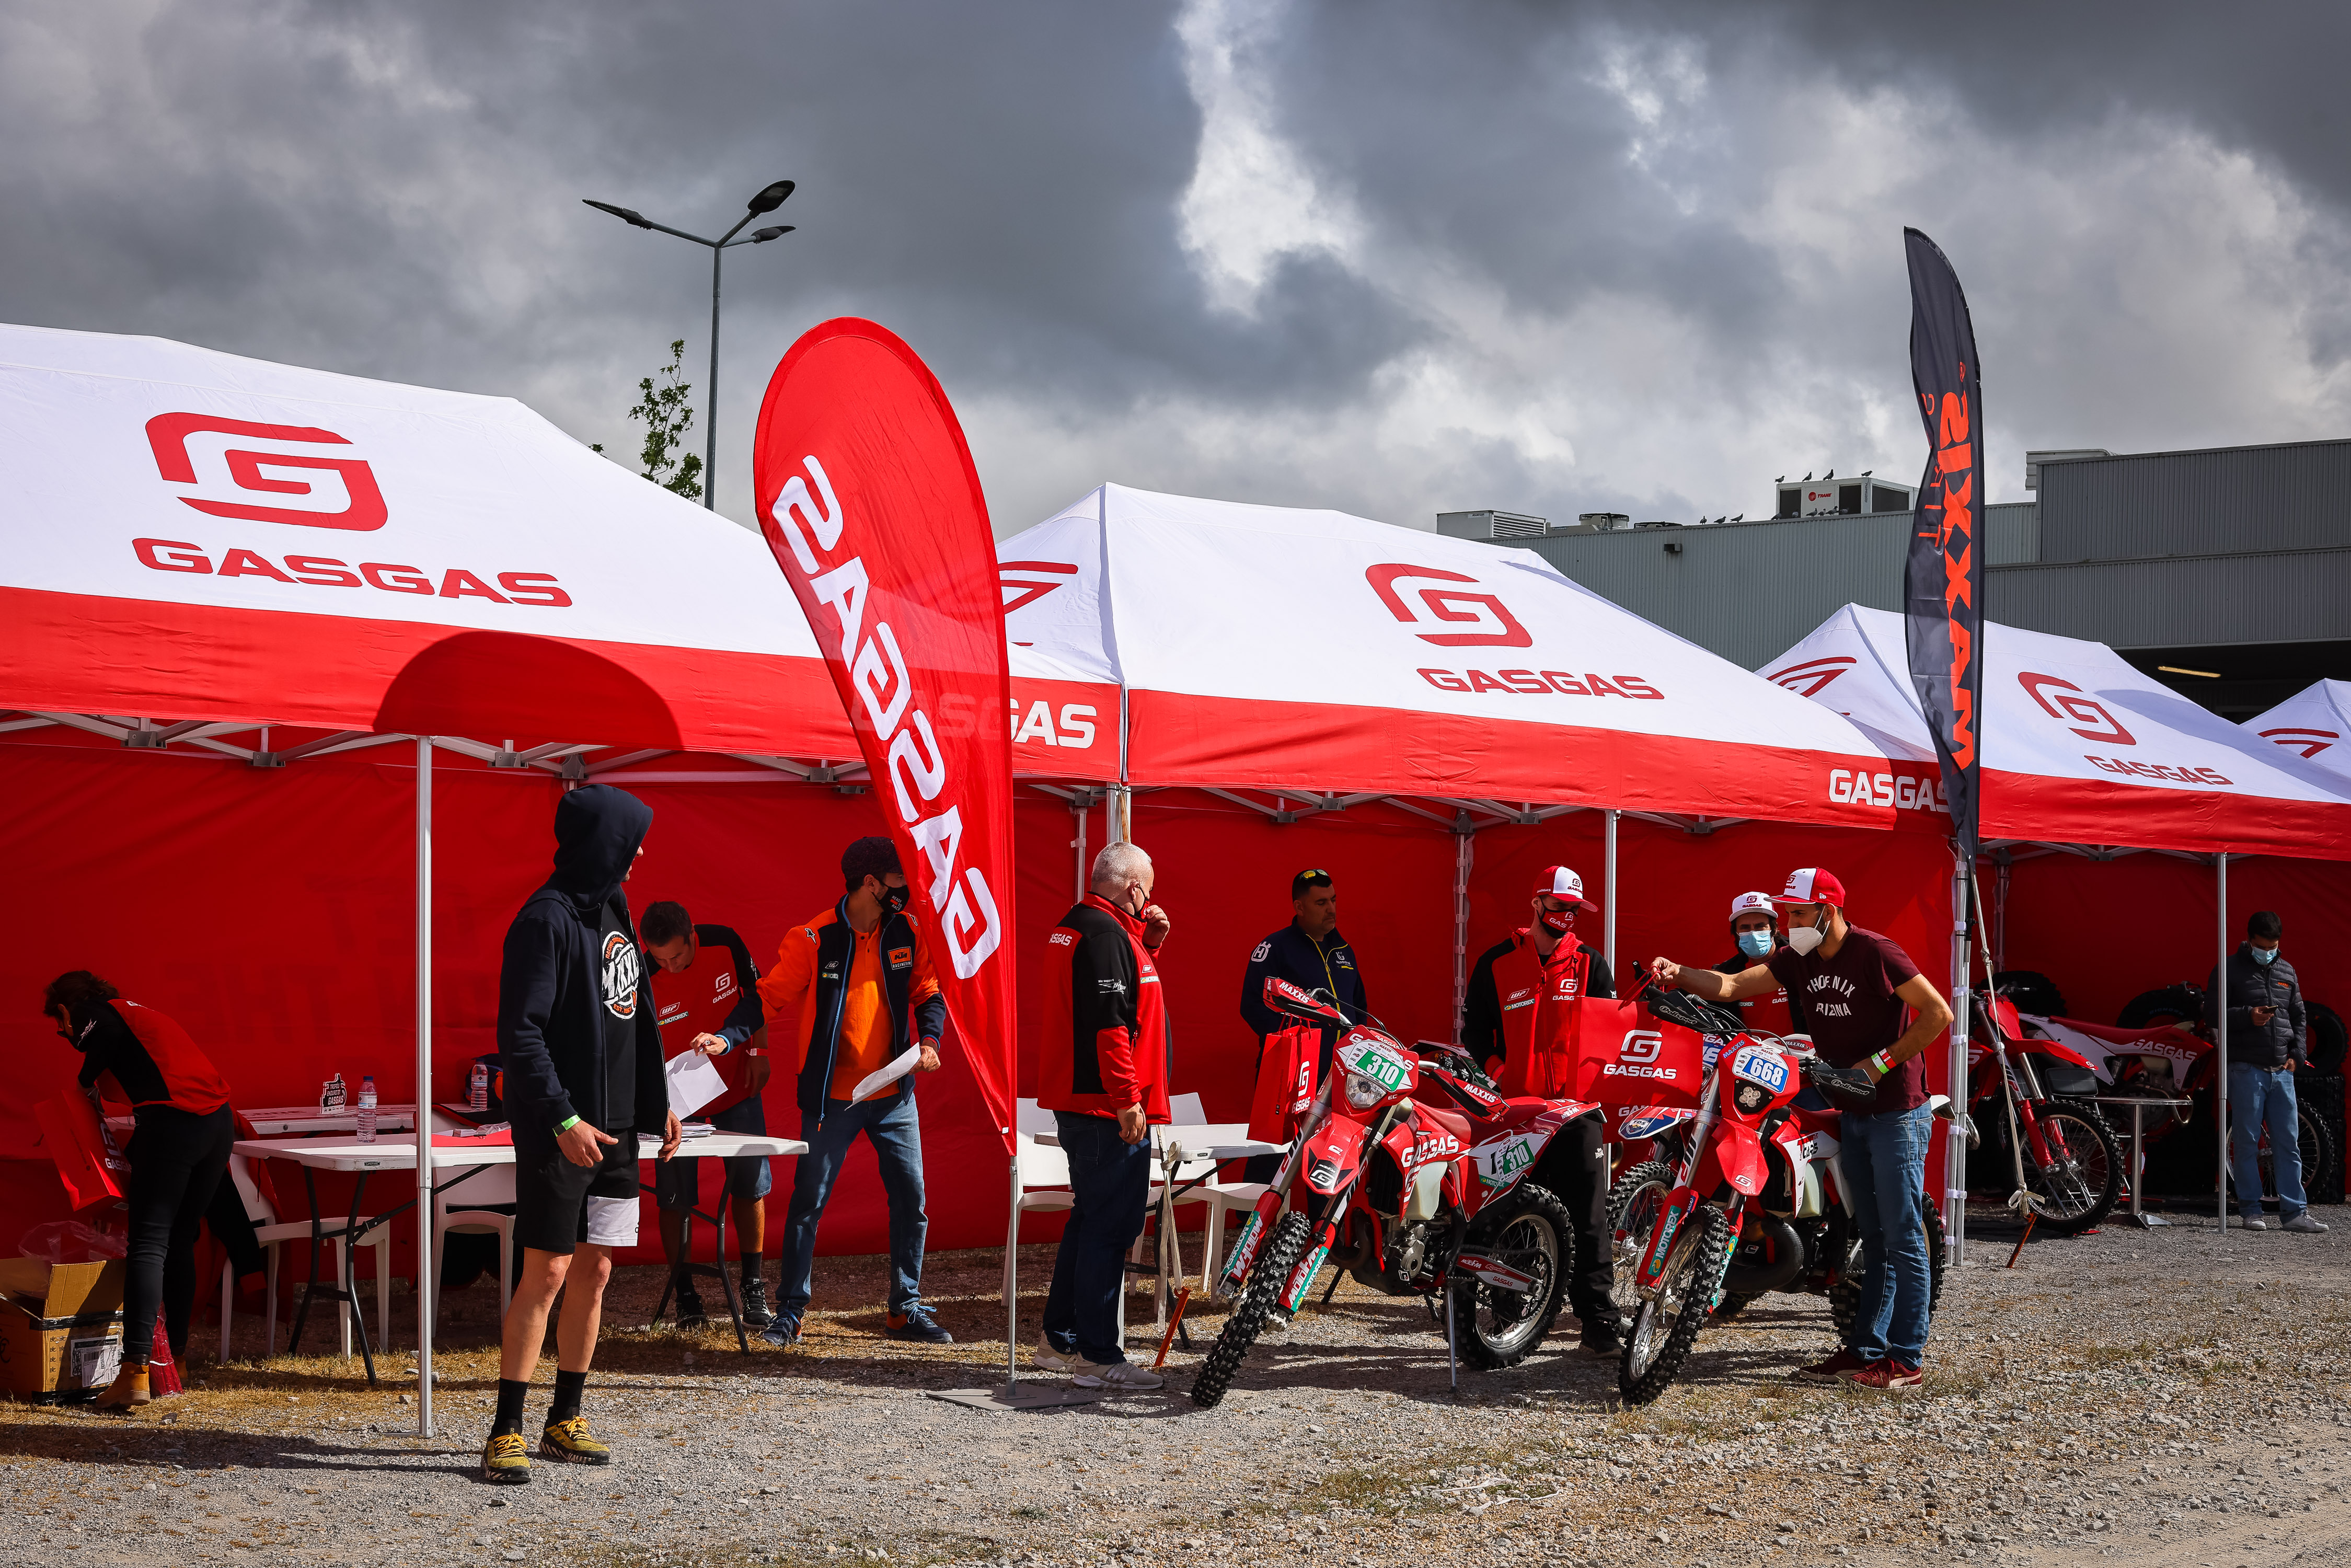 Troféu Enduro GasGas Portugal segue para a terceira jornada